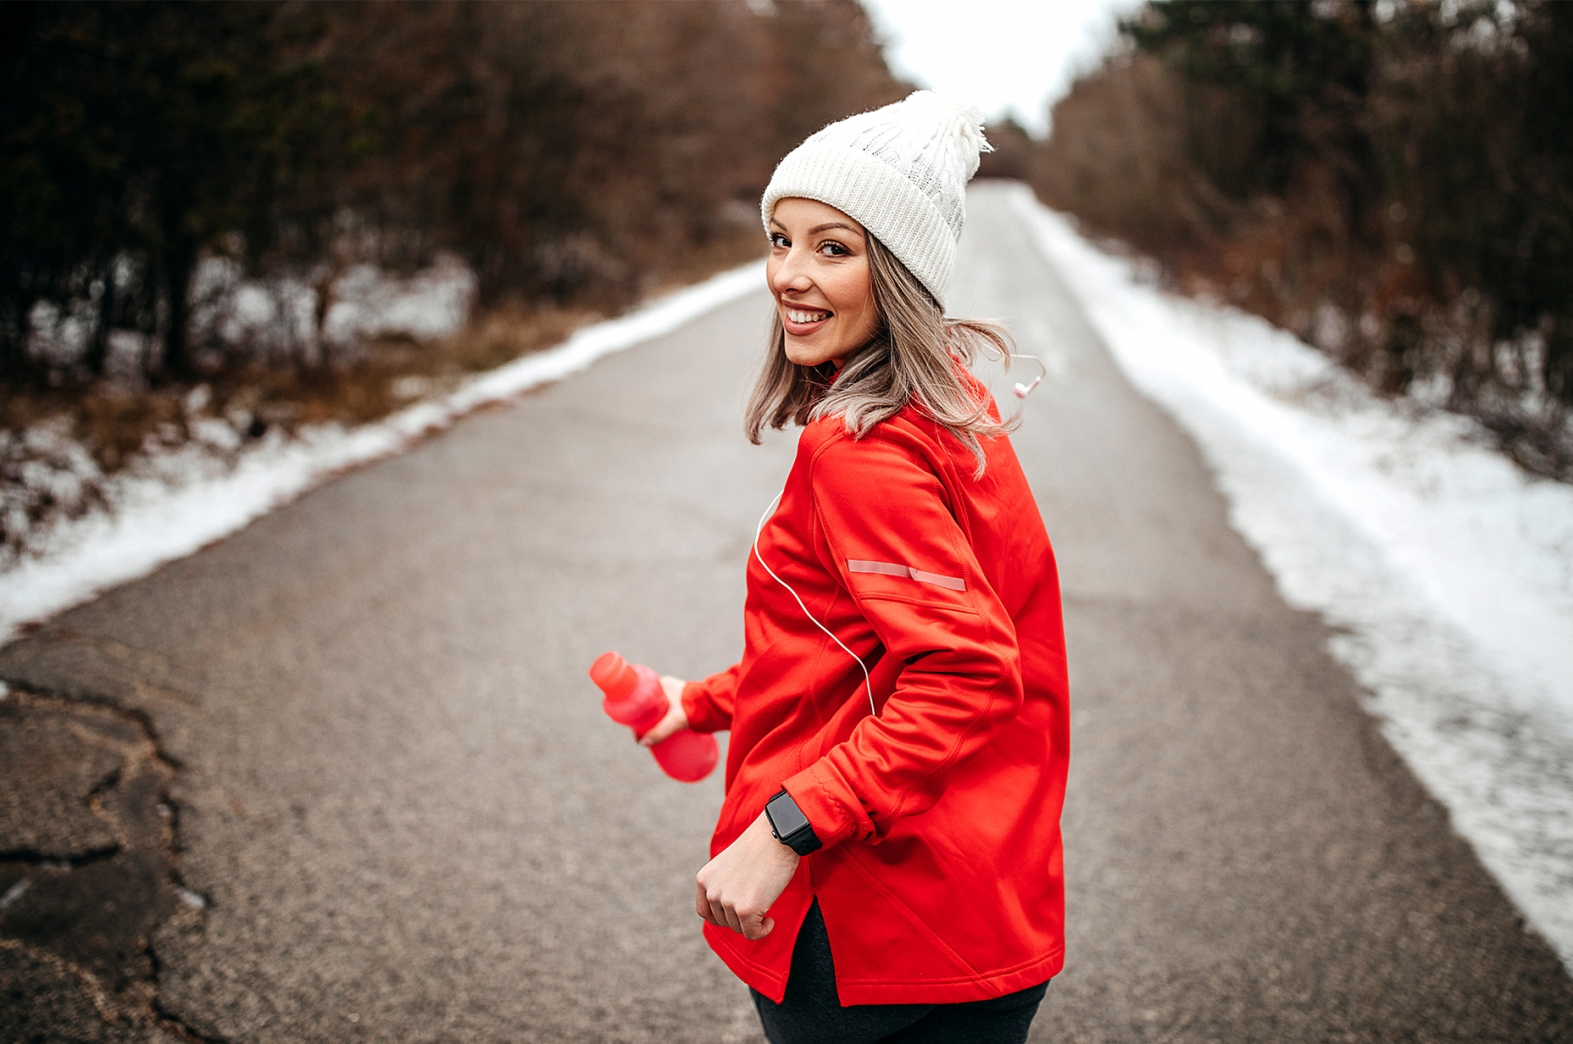 Junge Dame, blond mit roter Jacke